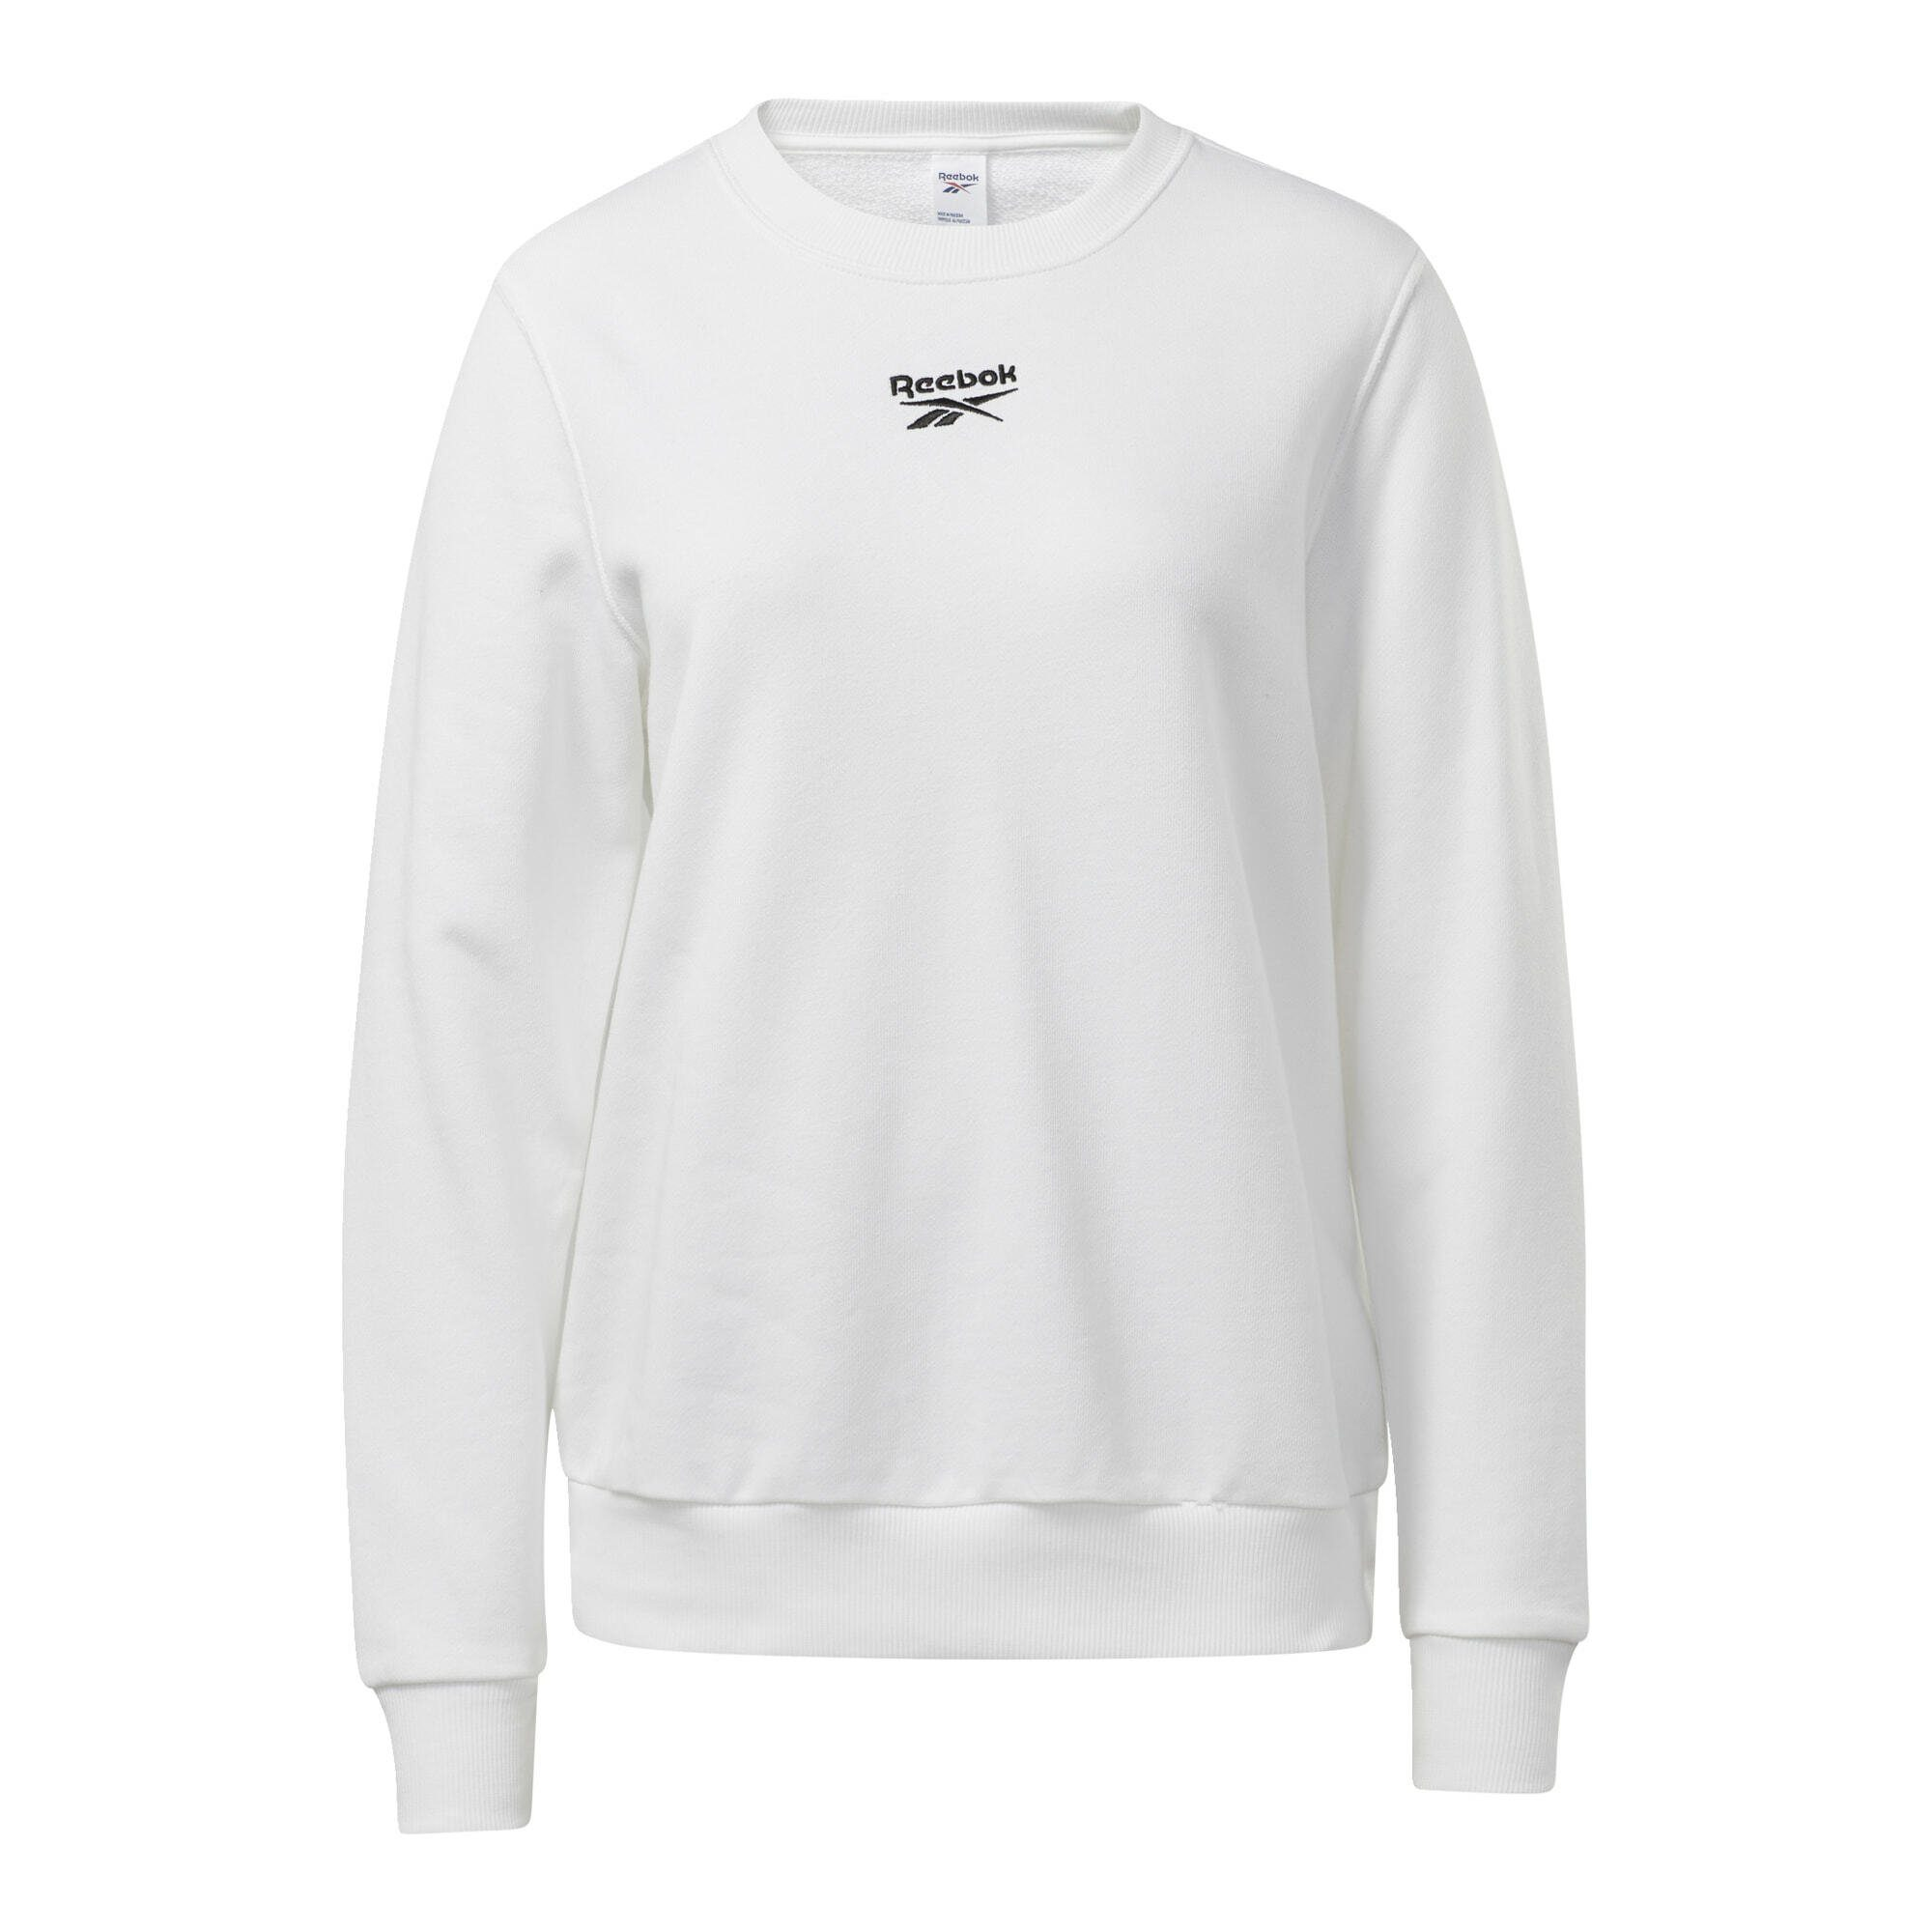 Details about Reebok Classics Vector Crew Sweatshirt Womens Size Large